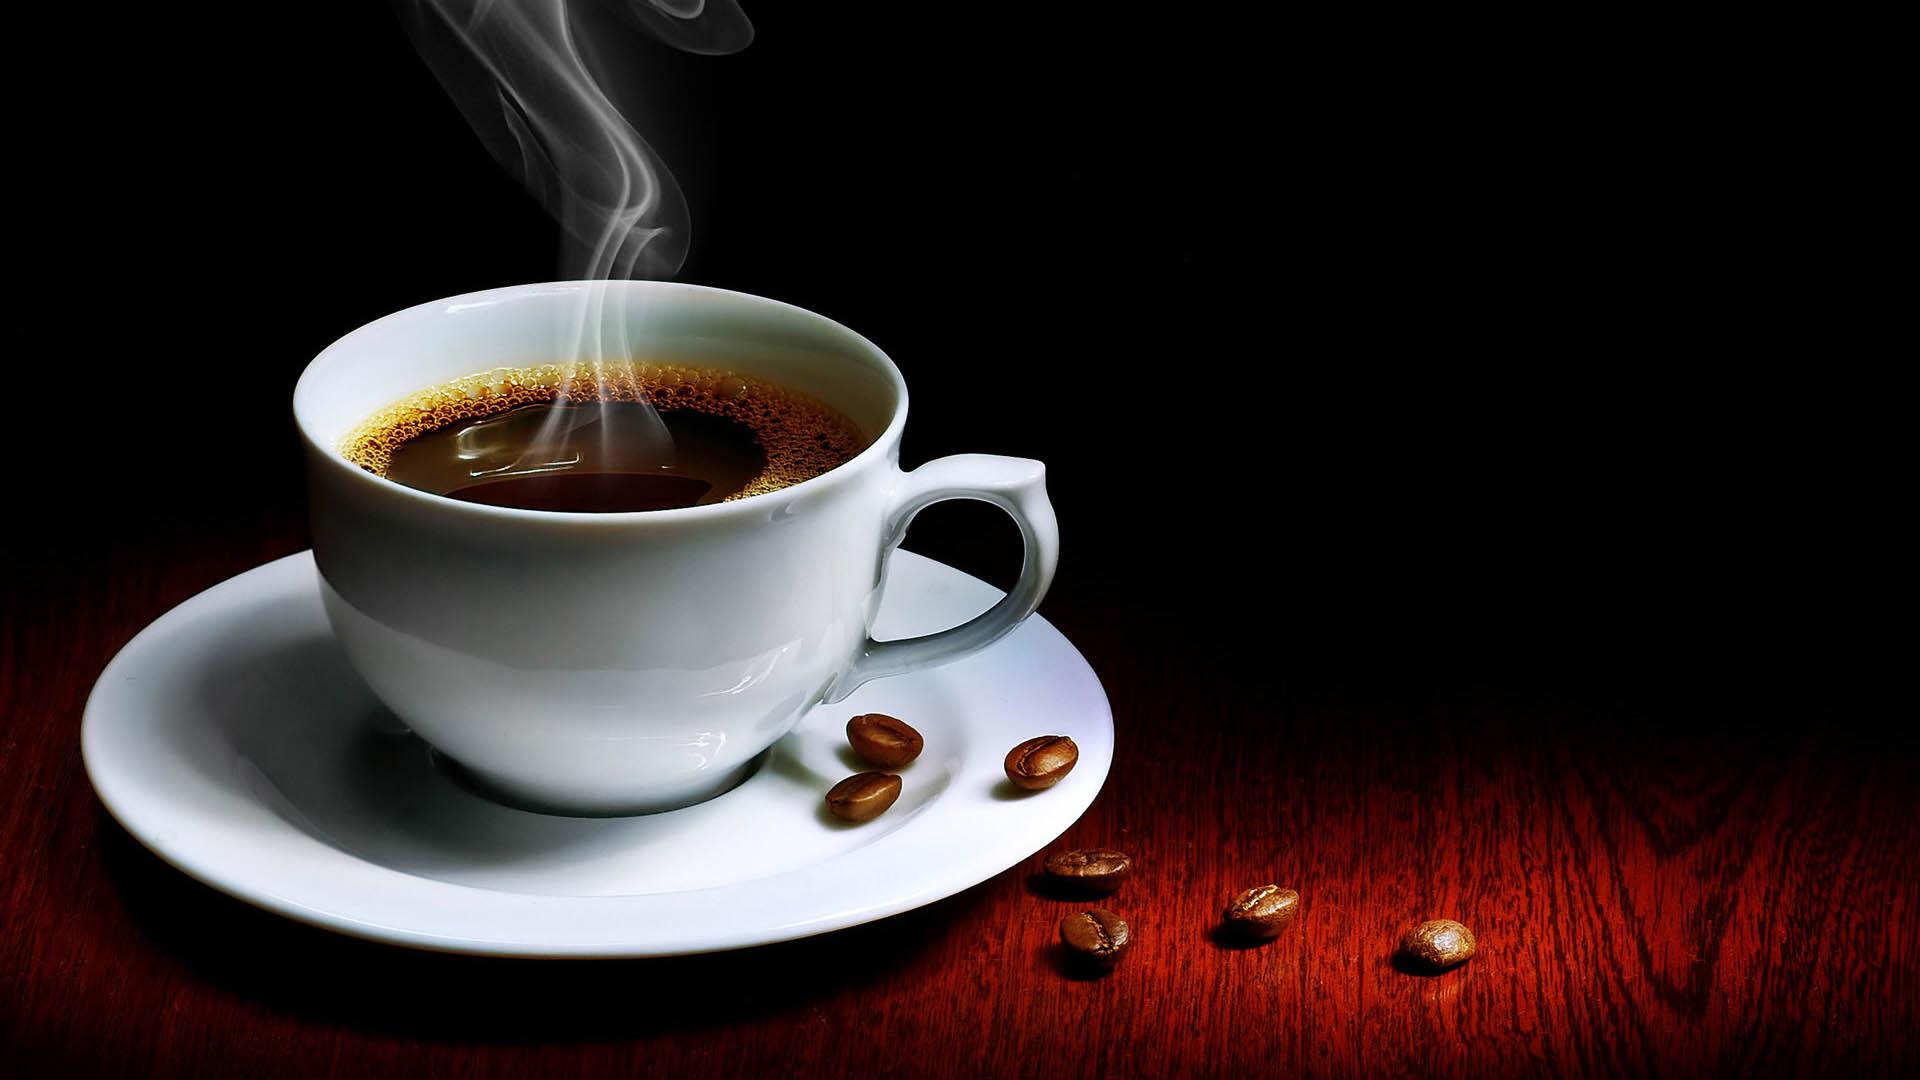 Coffee-HD-Wallpaper_2